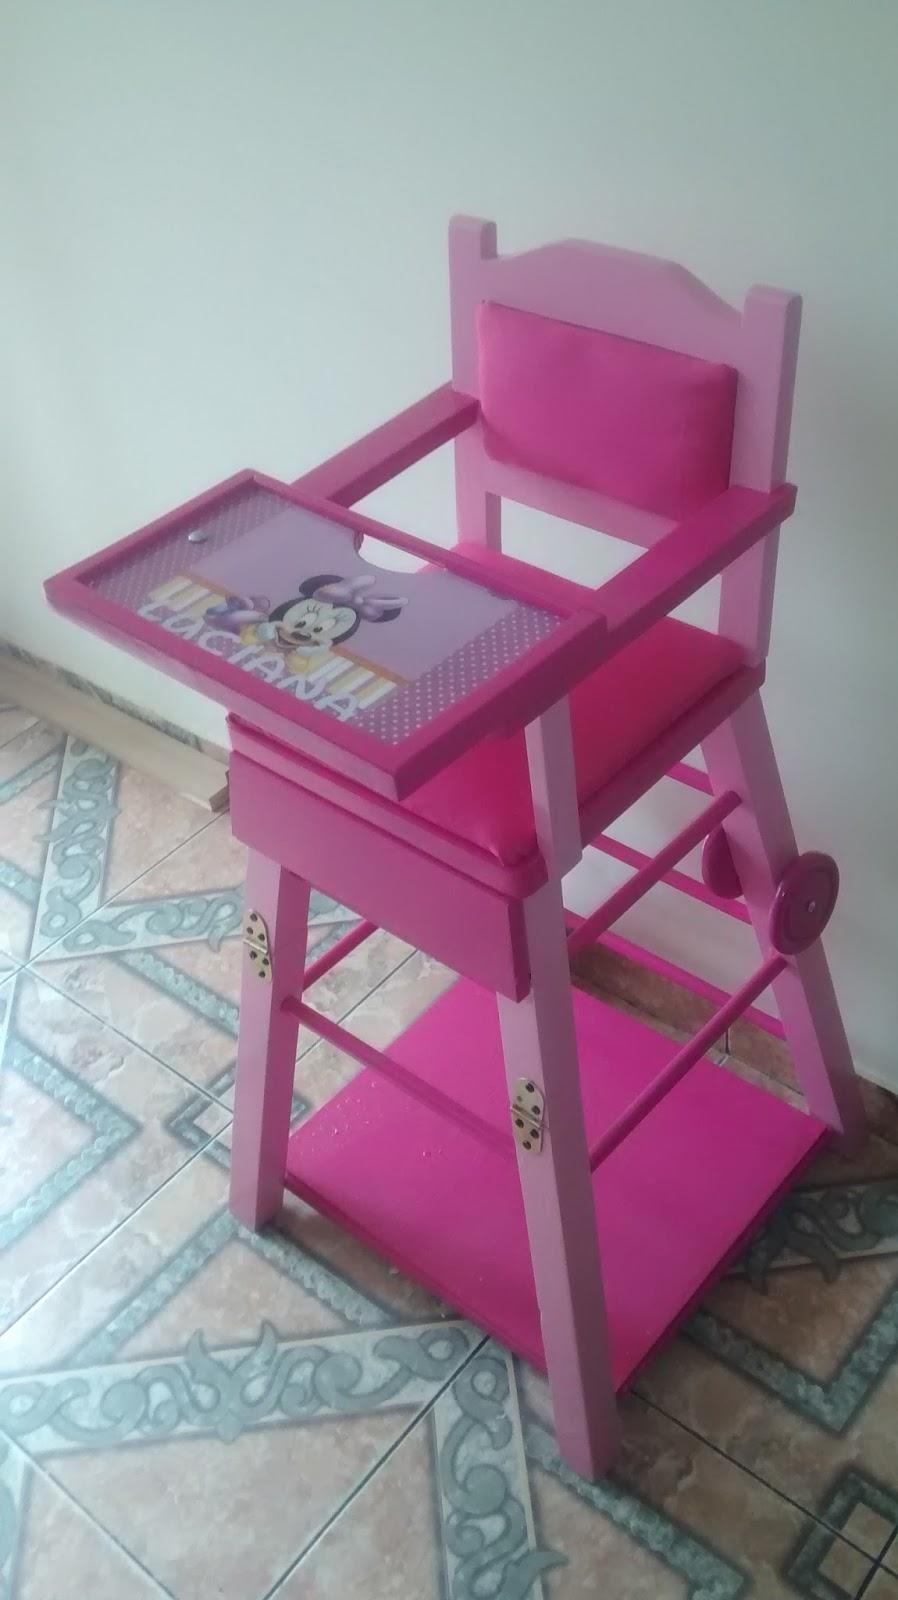 Galeria arte y dise o madekids silla comedor para bebe for Comedor de frutas para bebe